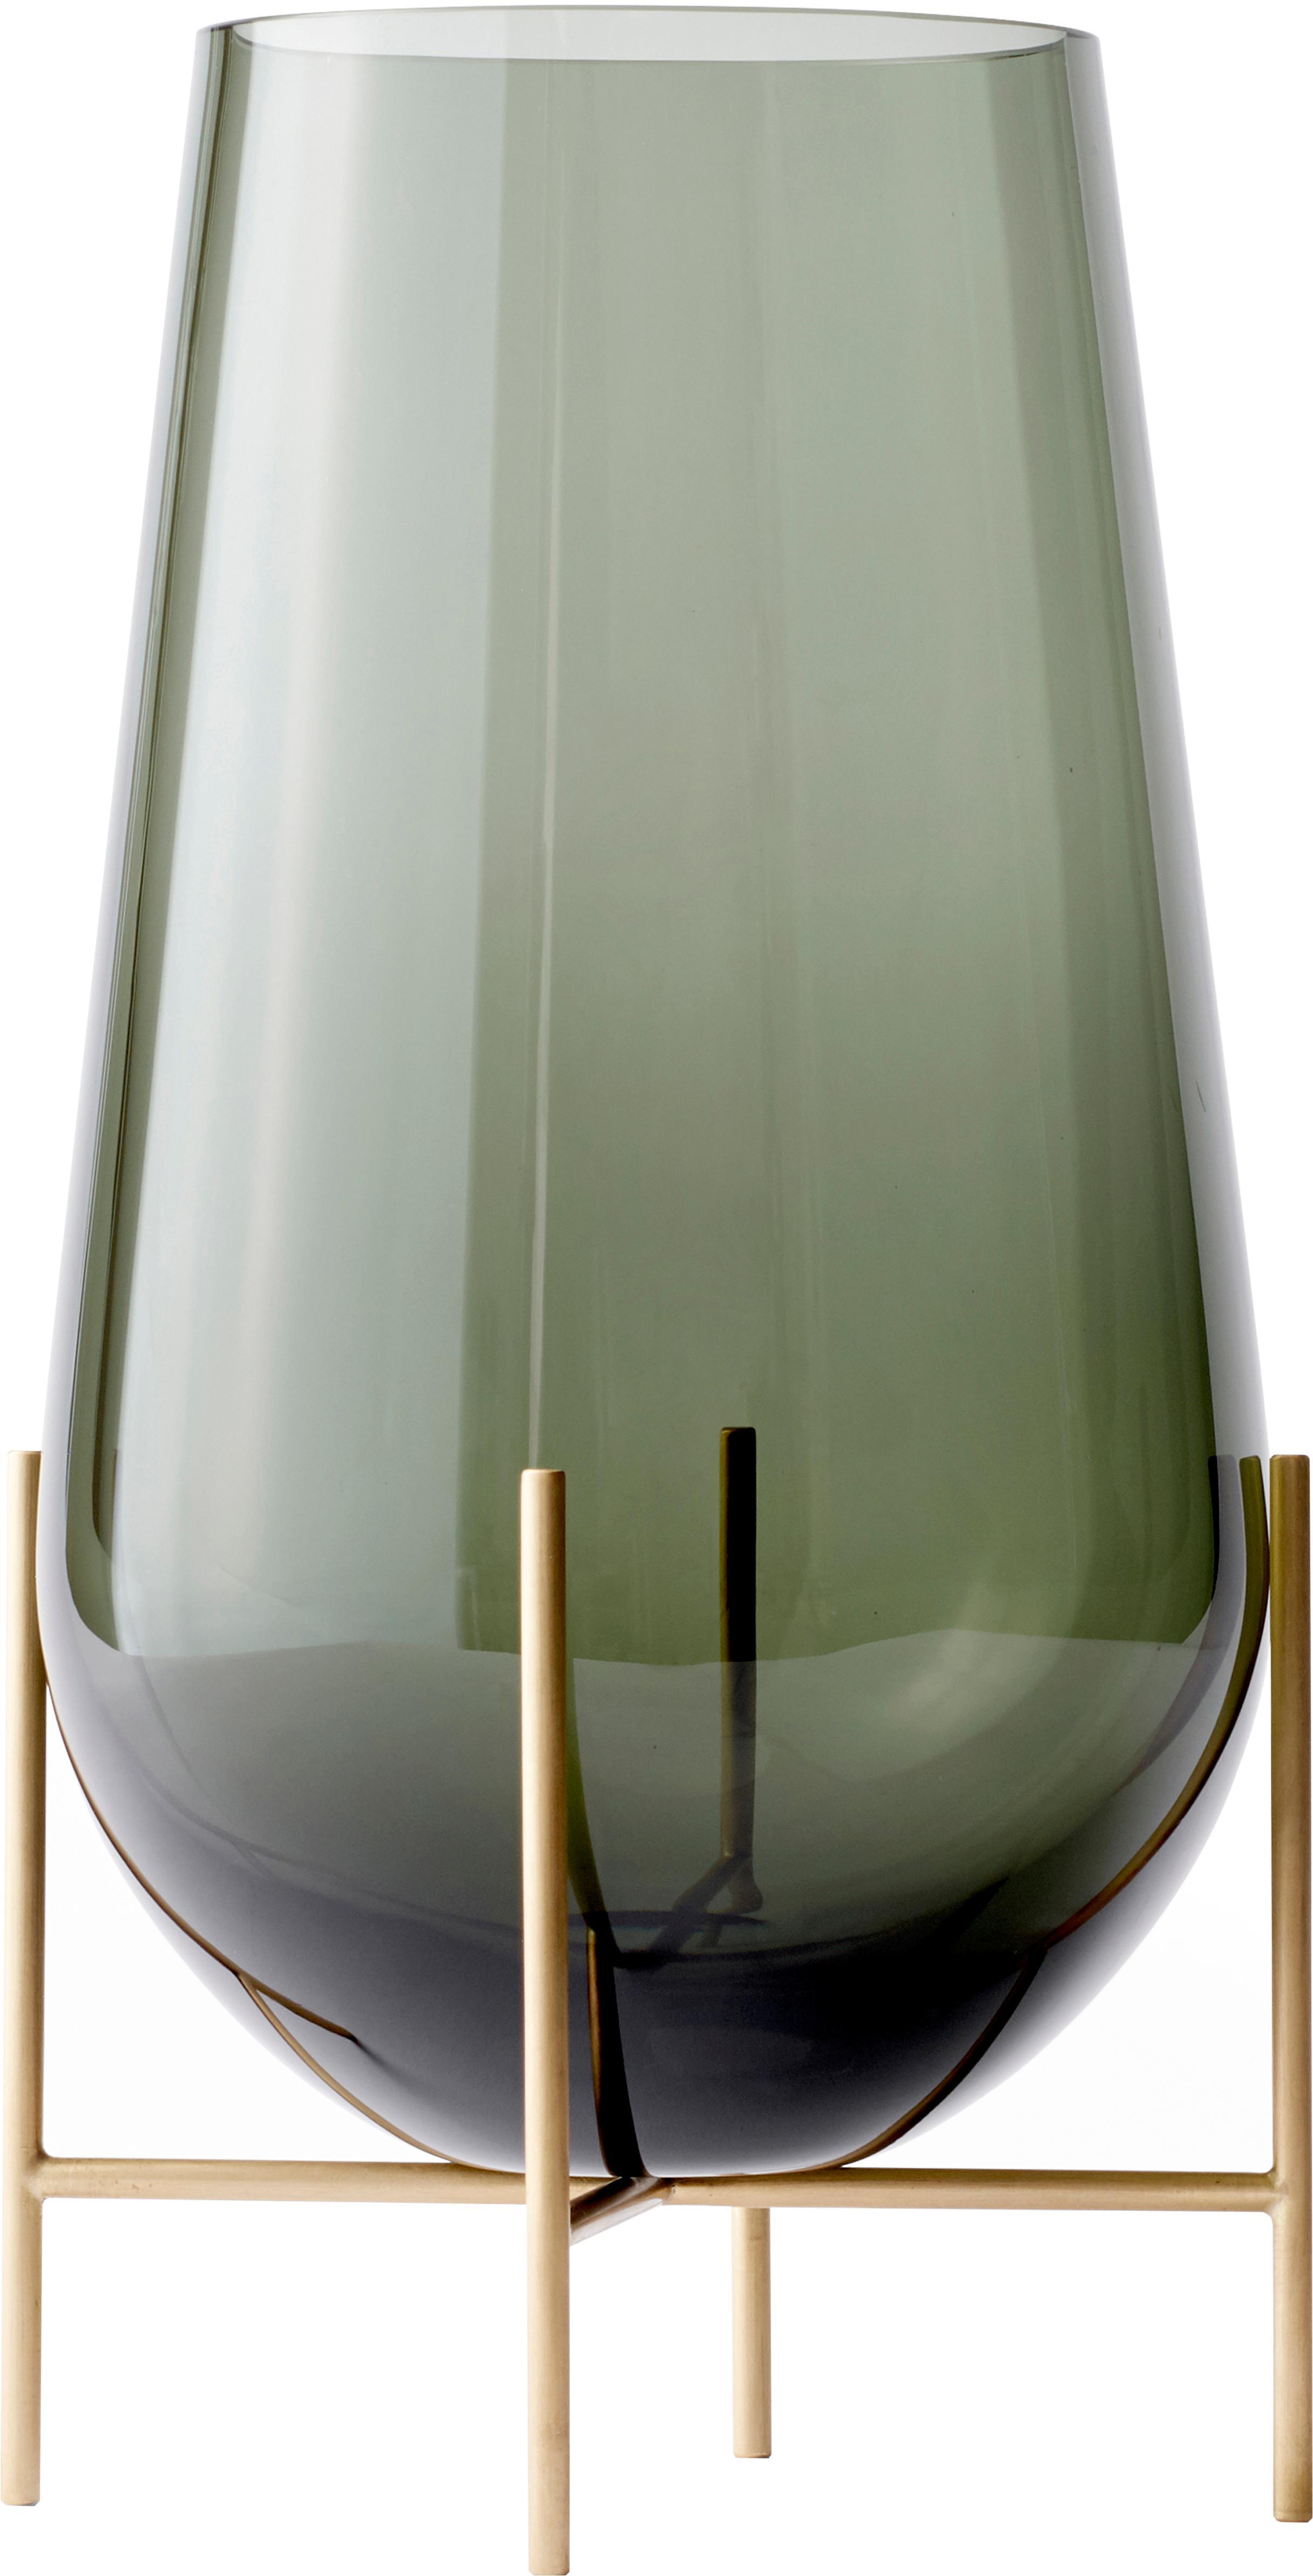 Grote design vaas Échasse, Frame: messing, Vaas: mondgeblazen glas, Messingkleurig, Ø 15 x H 45 cm